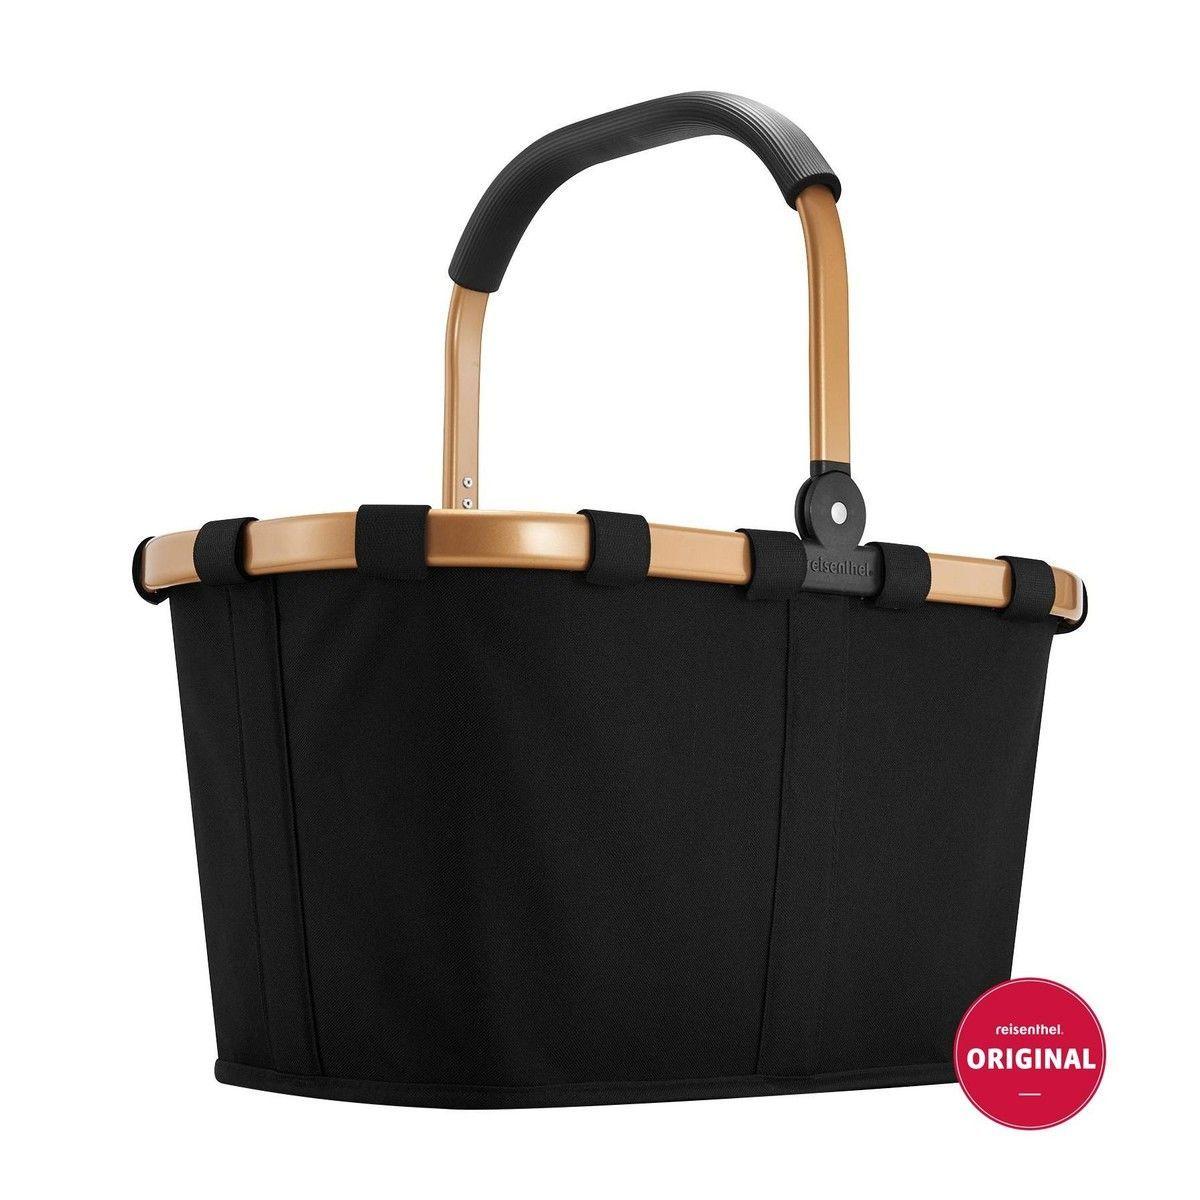 Reisenthel Carrybag Frame Shopping Bag Reisenthel Bags